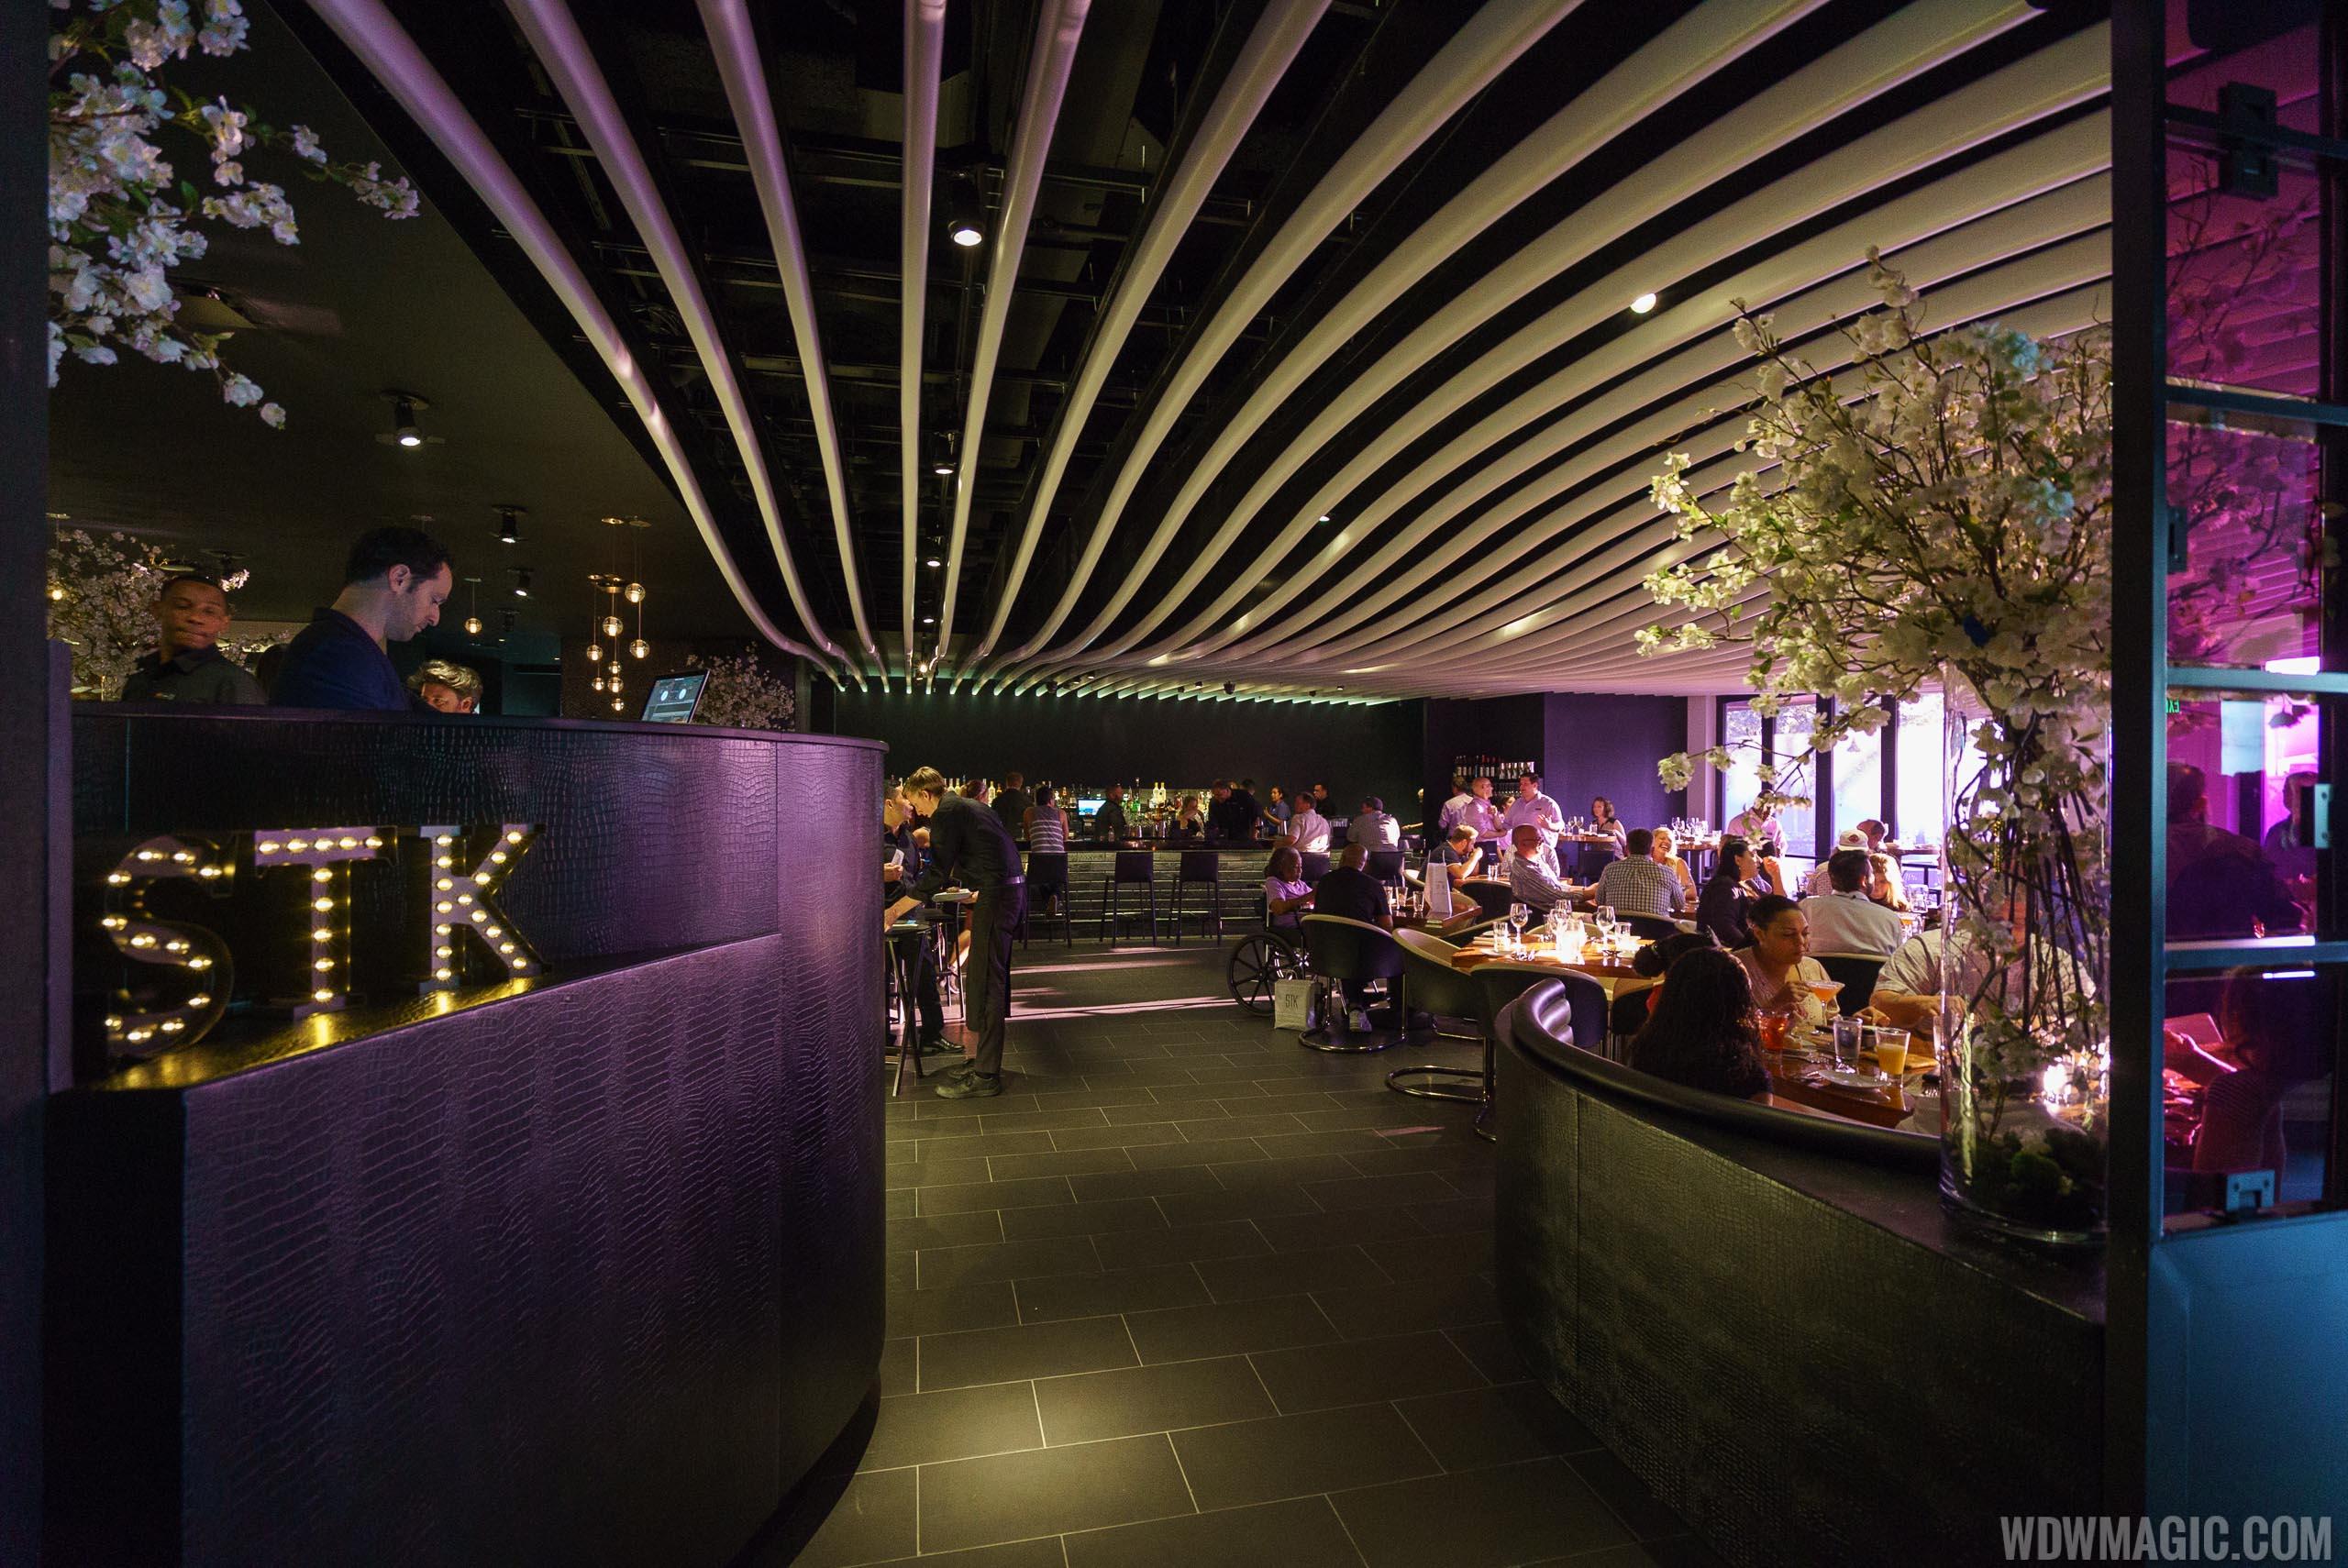 STK Orlando - Entering dining room on ground level